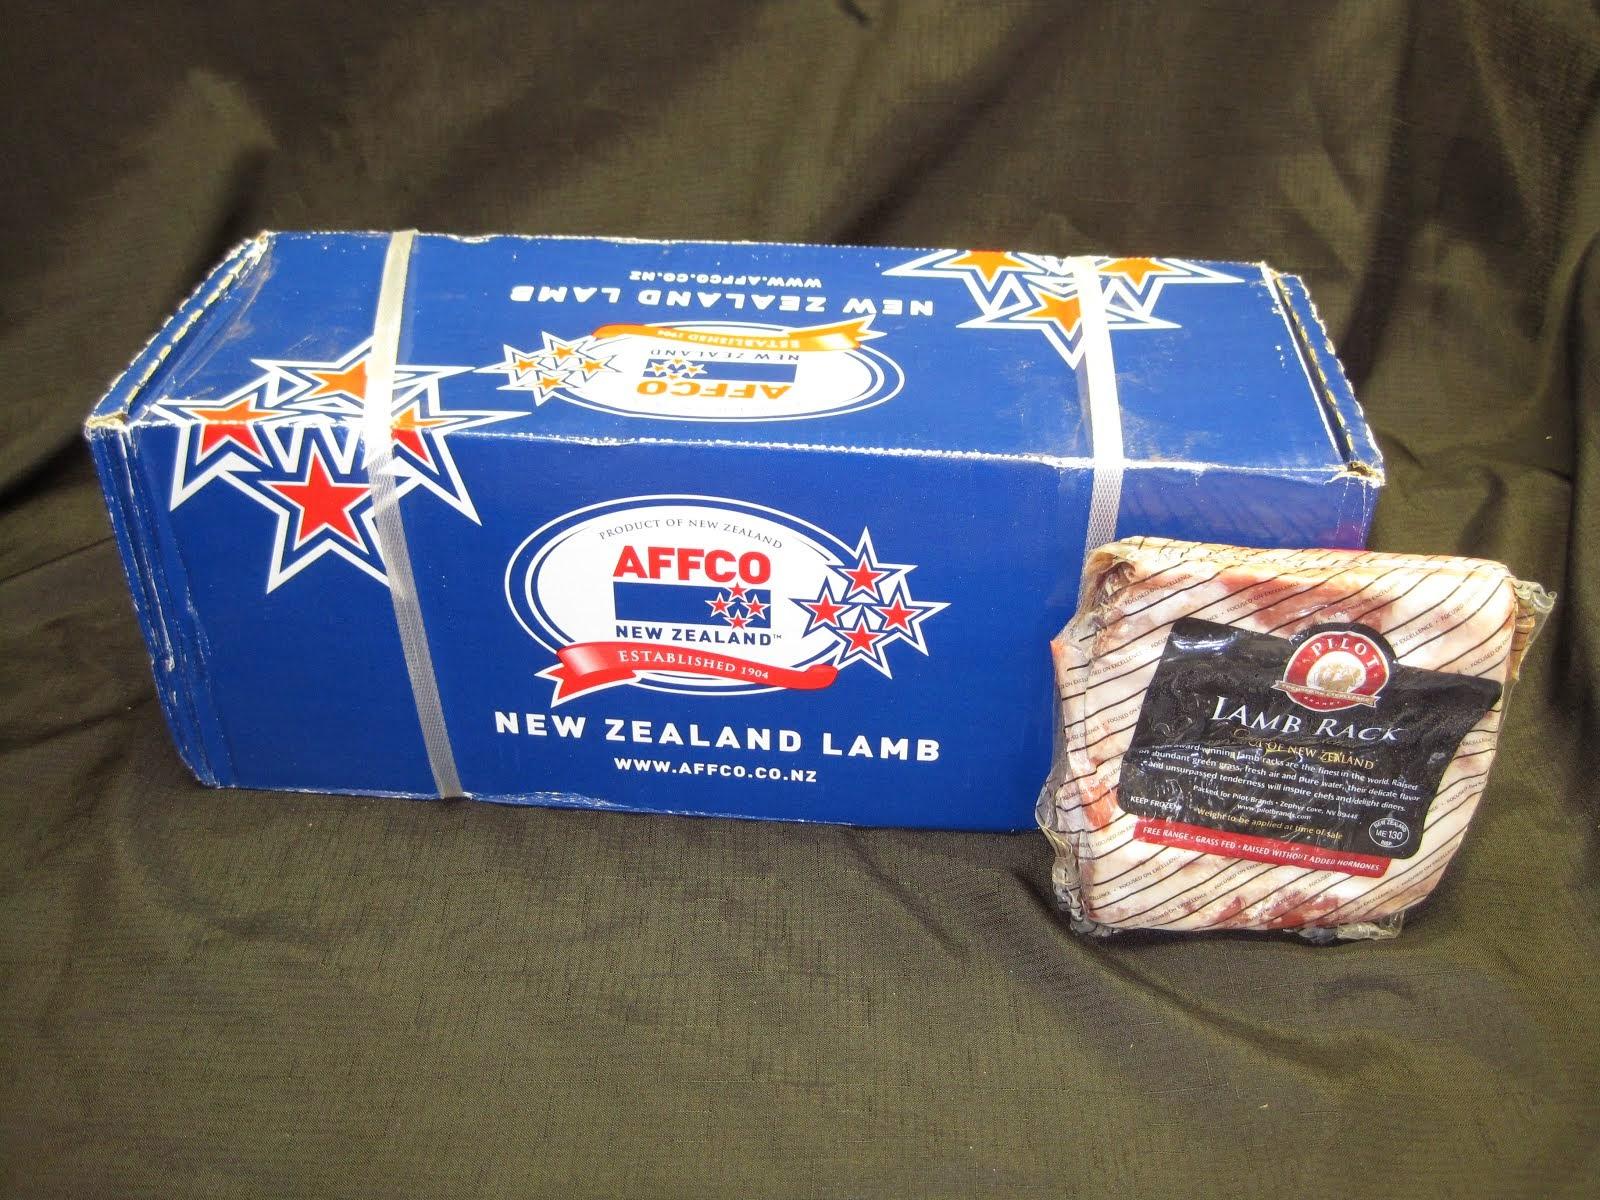 New Zealand Rack of Lamb - Item # 14200 & 14201 for the split